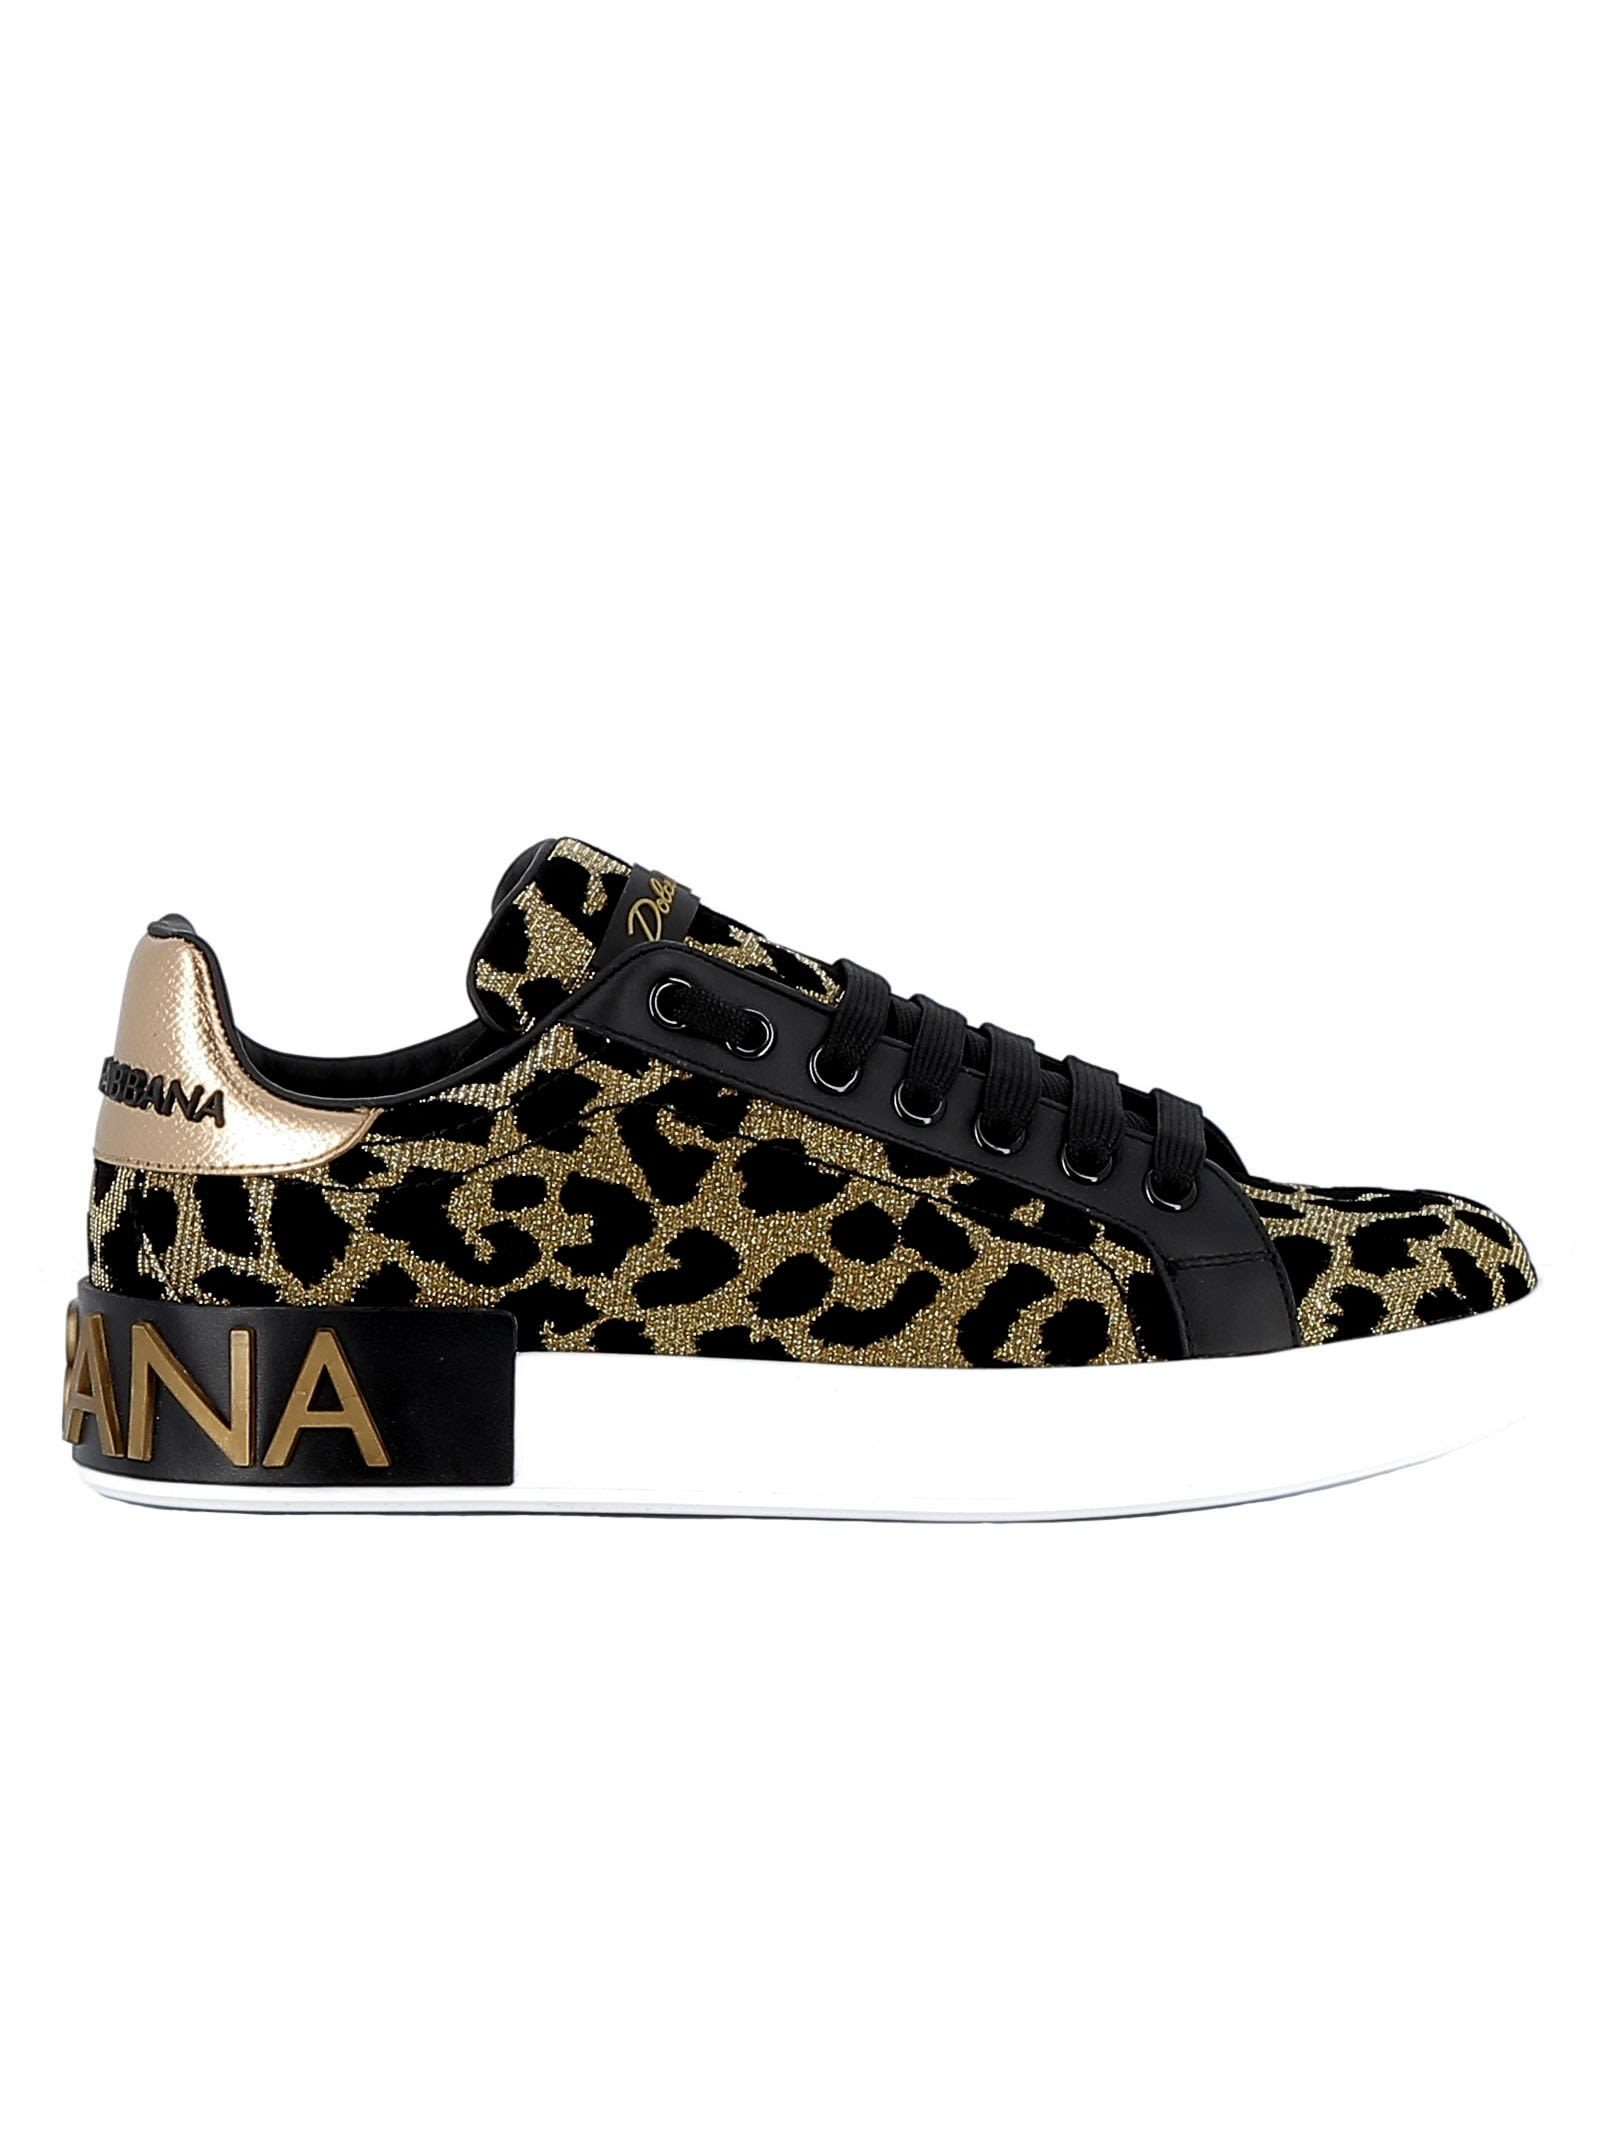 Dolce & Gabbana Gold/black Fabric Sneakers thumbnail